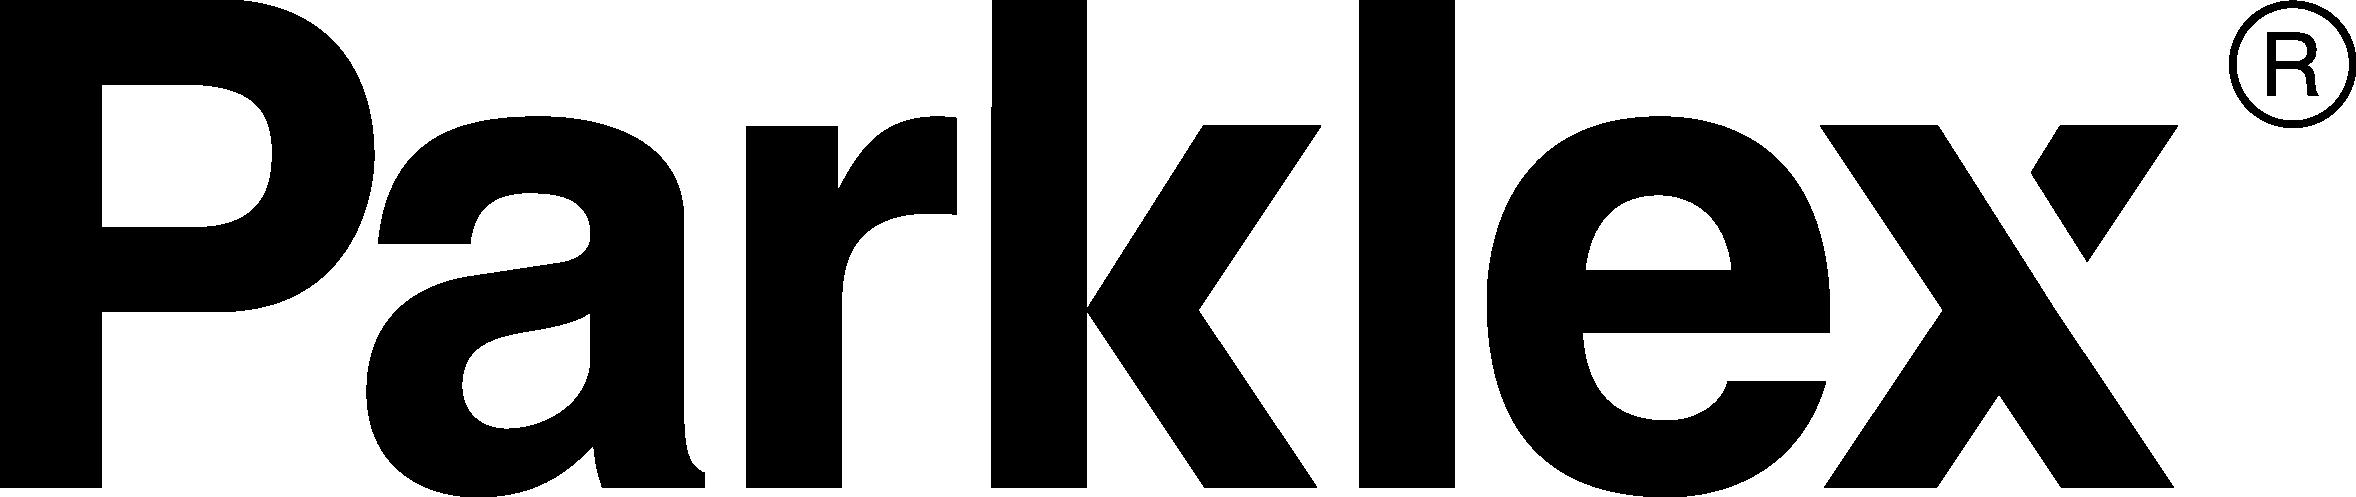 instaparklex